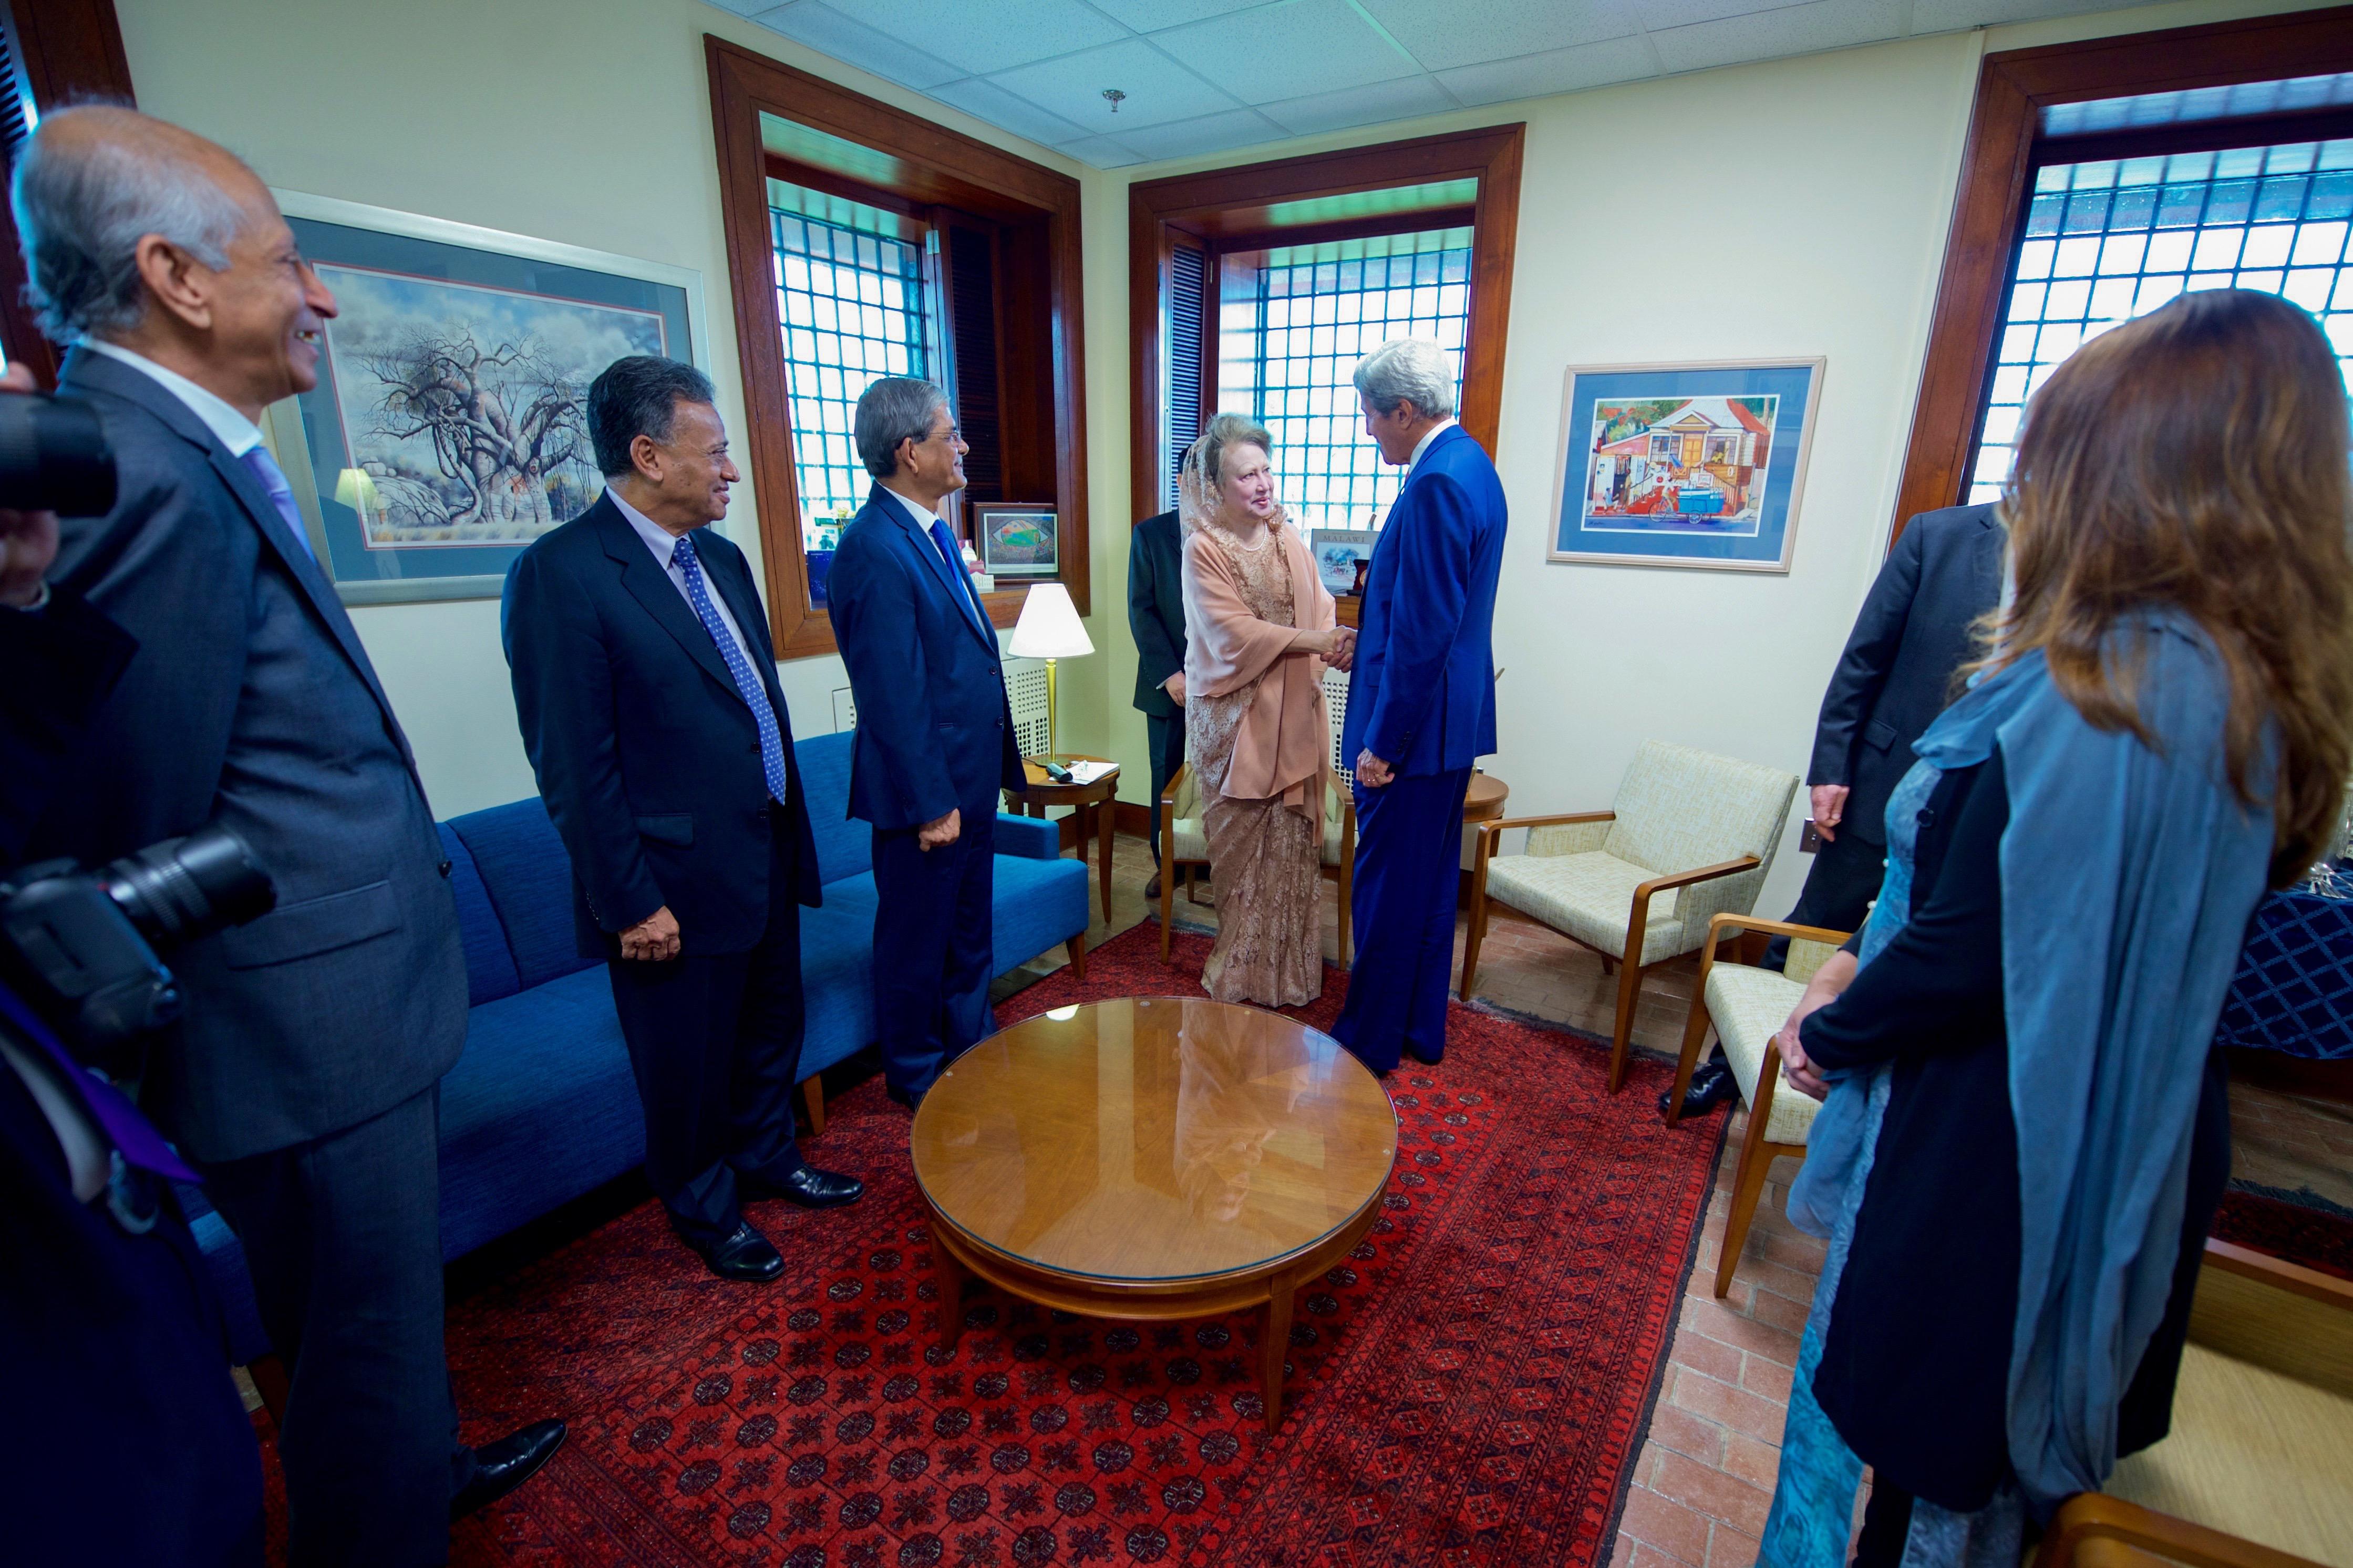 File:Secretary Kerry Greets Begum Khaleda Zia at the U.S. Embassy ...